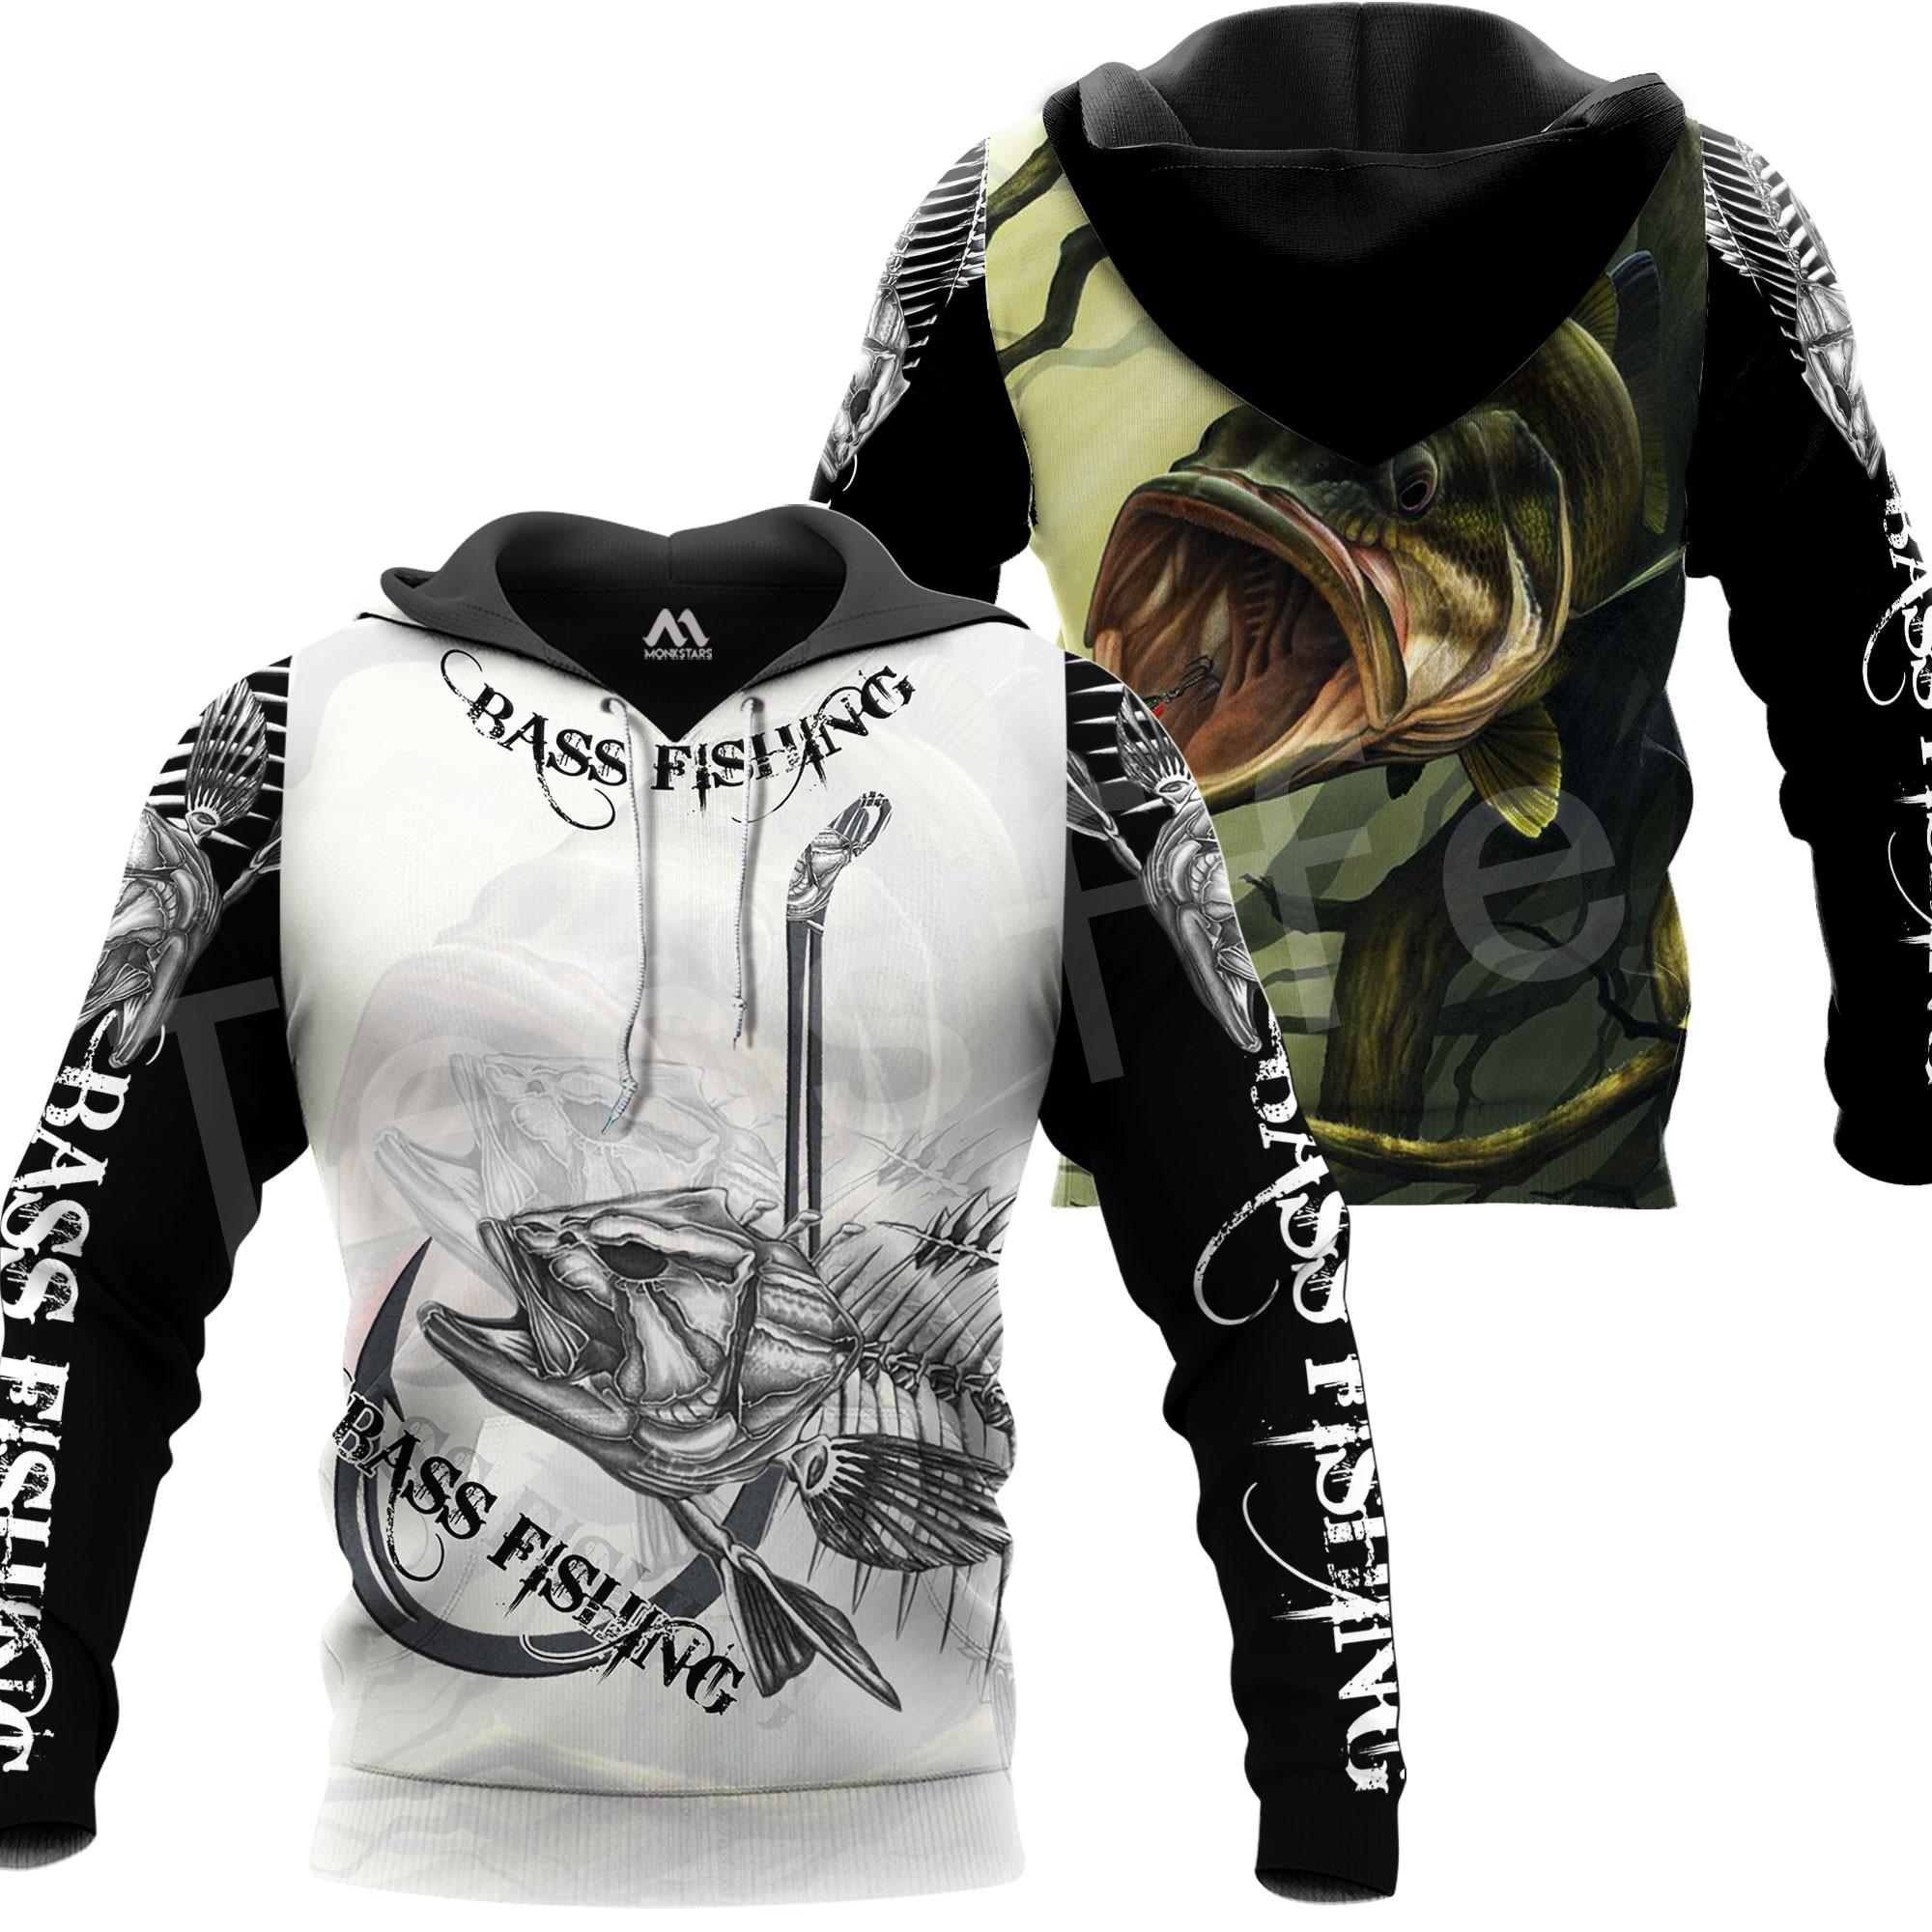 Tessffel NewFashion Animal Marlin Hunting Fishing Harajuku Casual Pullover 3DPrint Zipper/Hoodie/Sweatshirt/Jacket/Men/Women S17